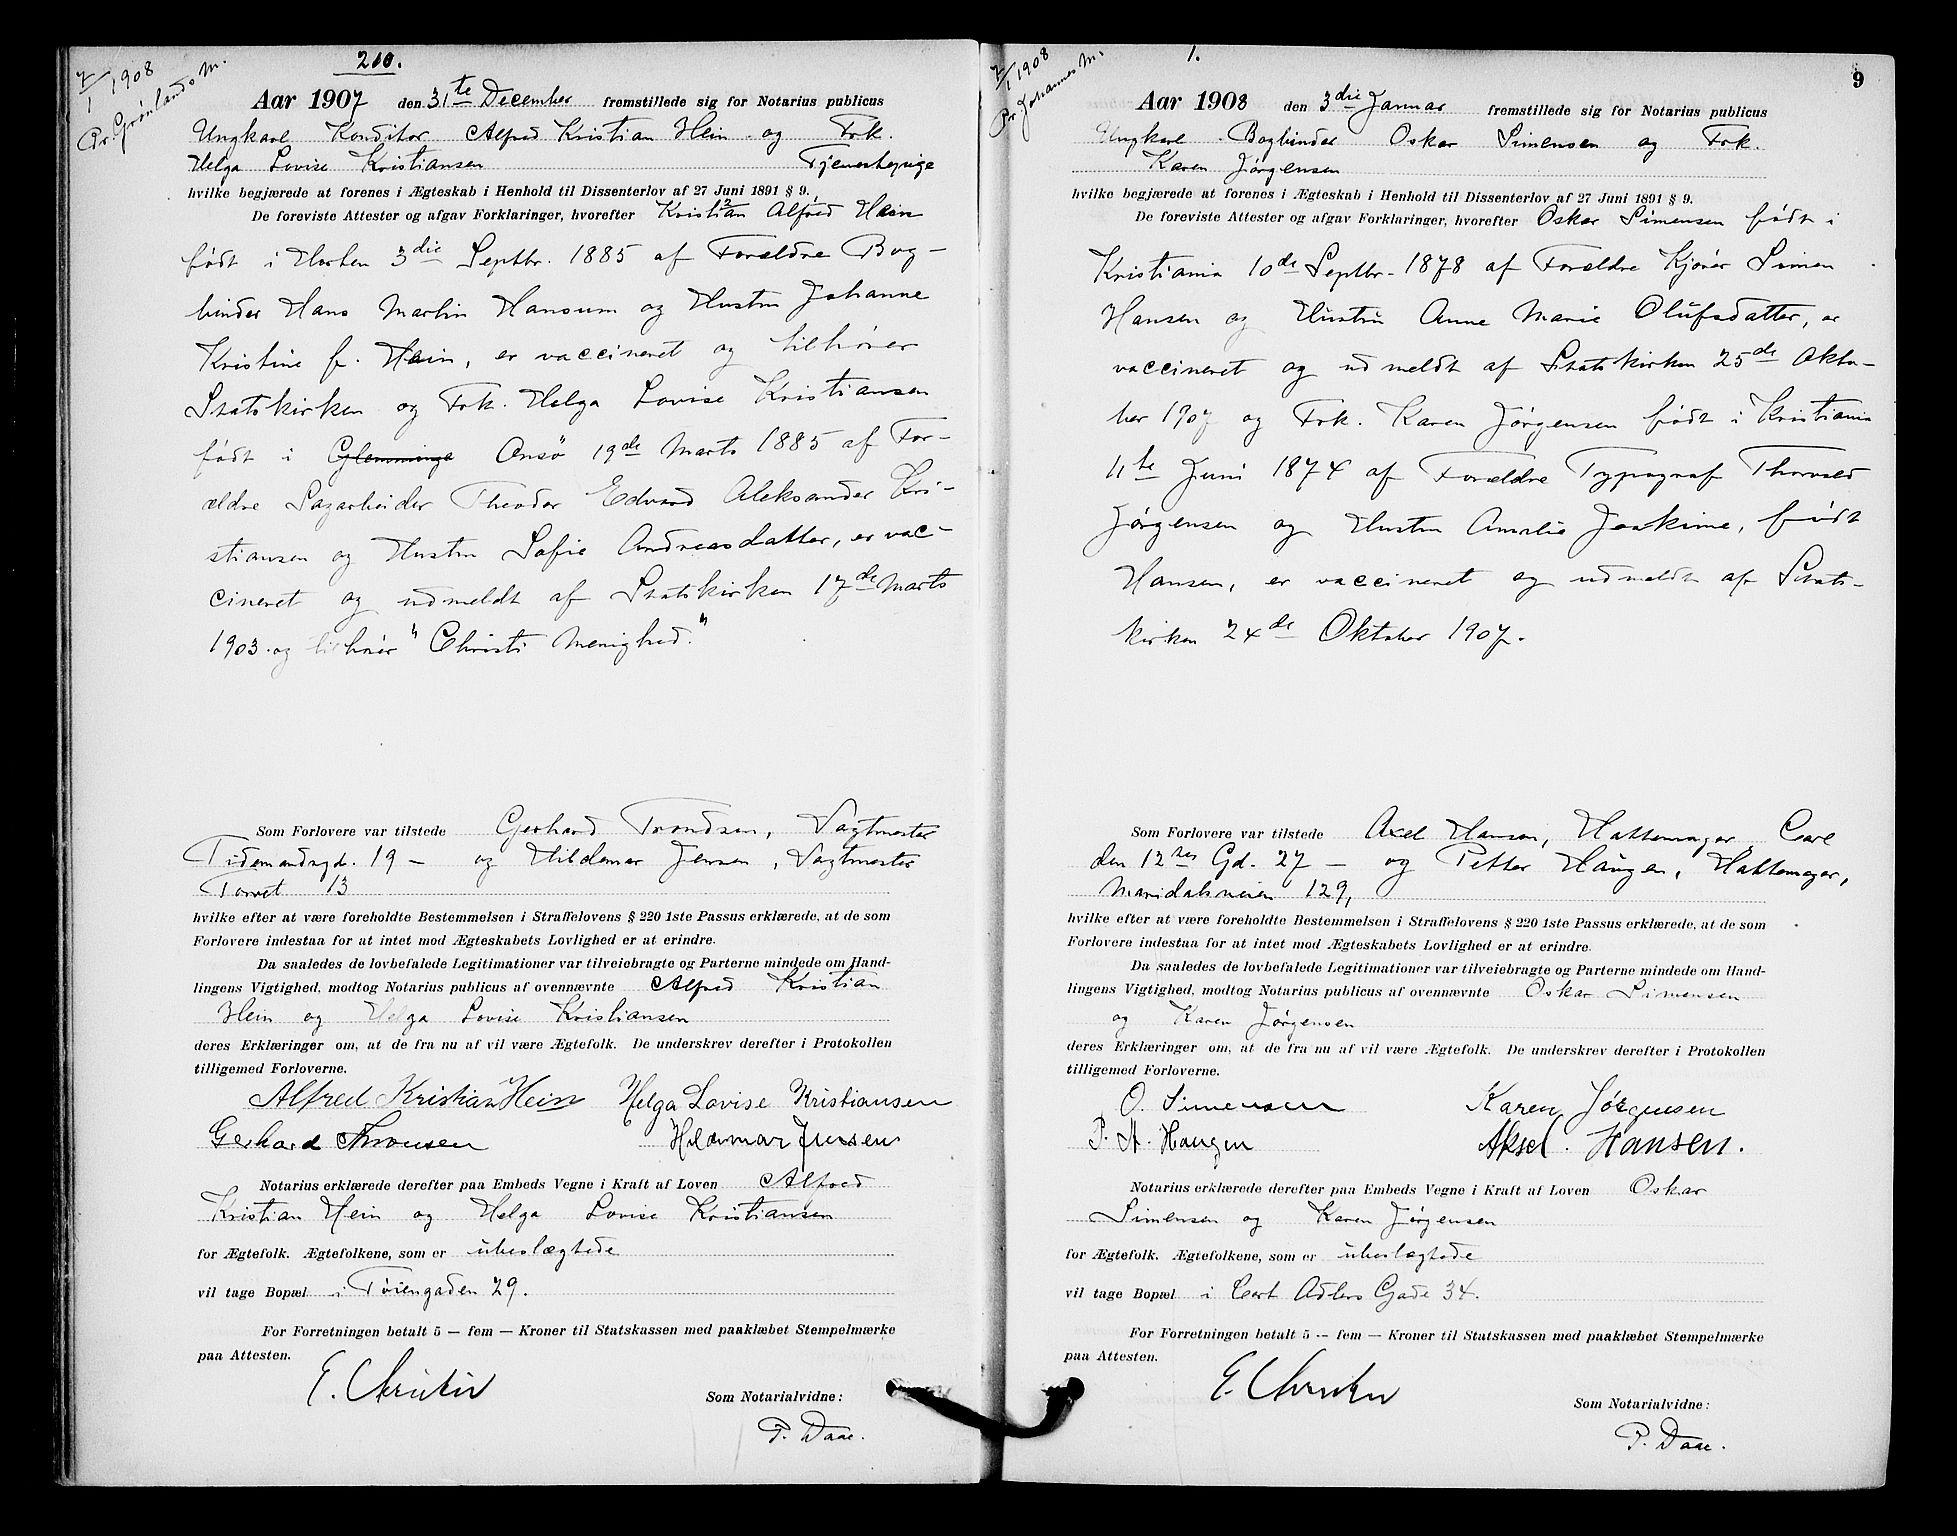 SAO, Oslo byfogd avd. I, L/Lb/Lbb/L0007: Notarialprotokoll, rekke II: Vigsler, 1907-1911, s. 8b-9a